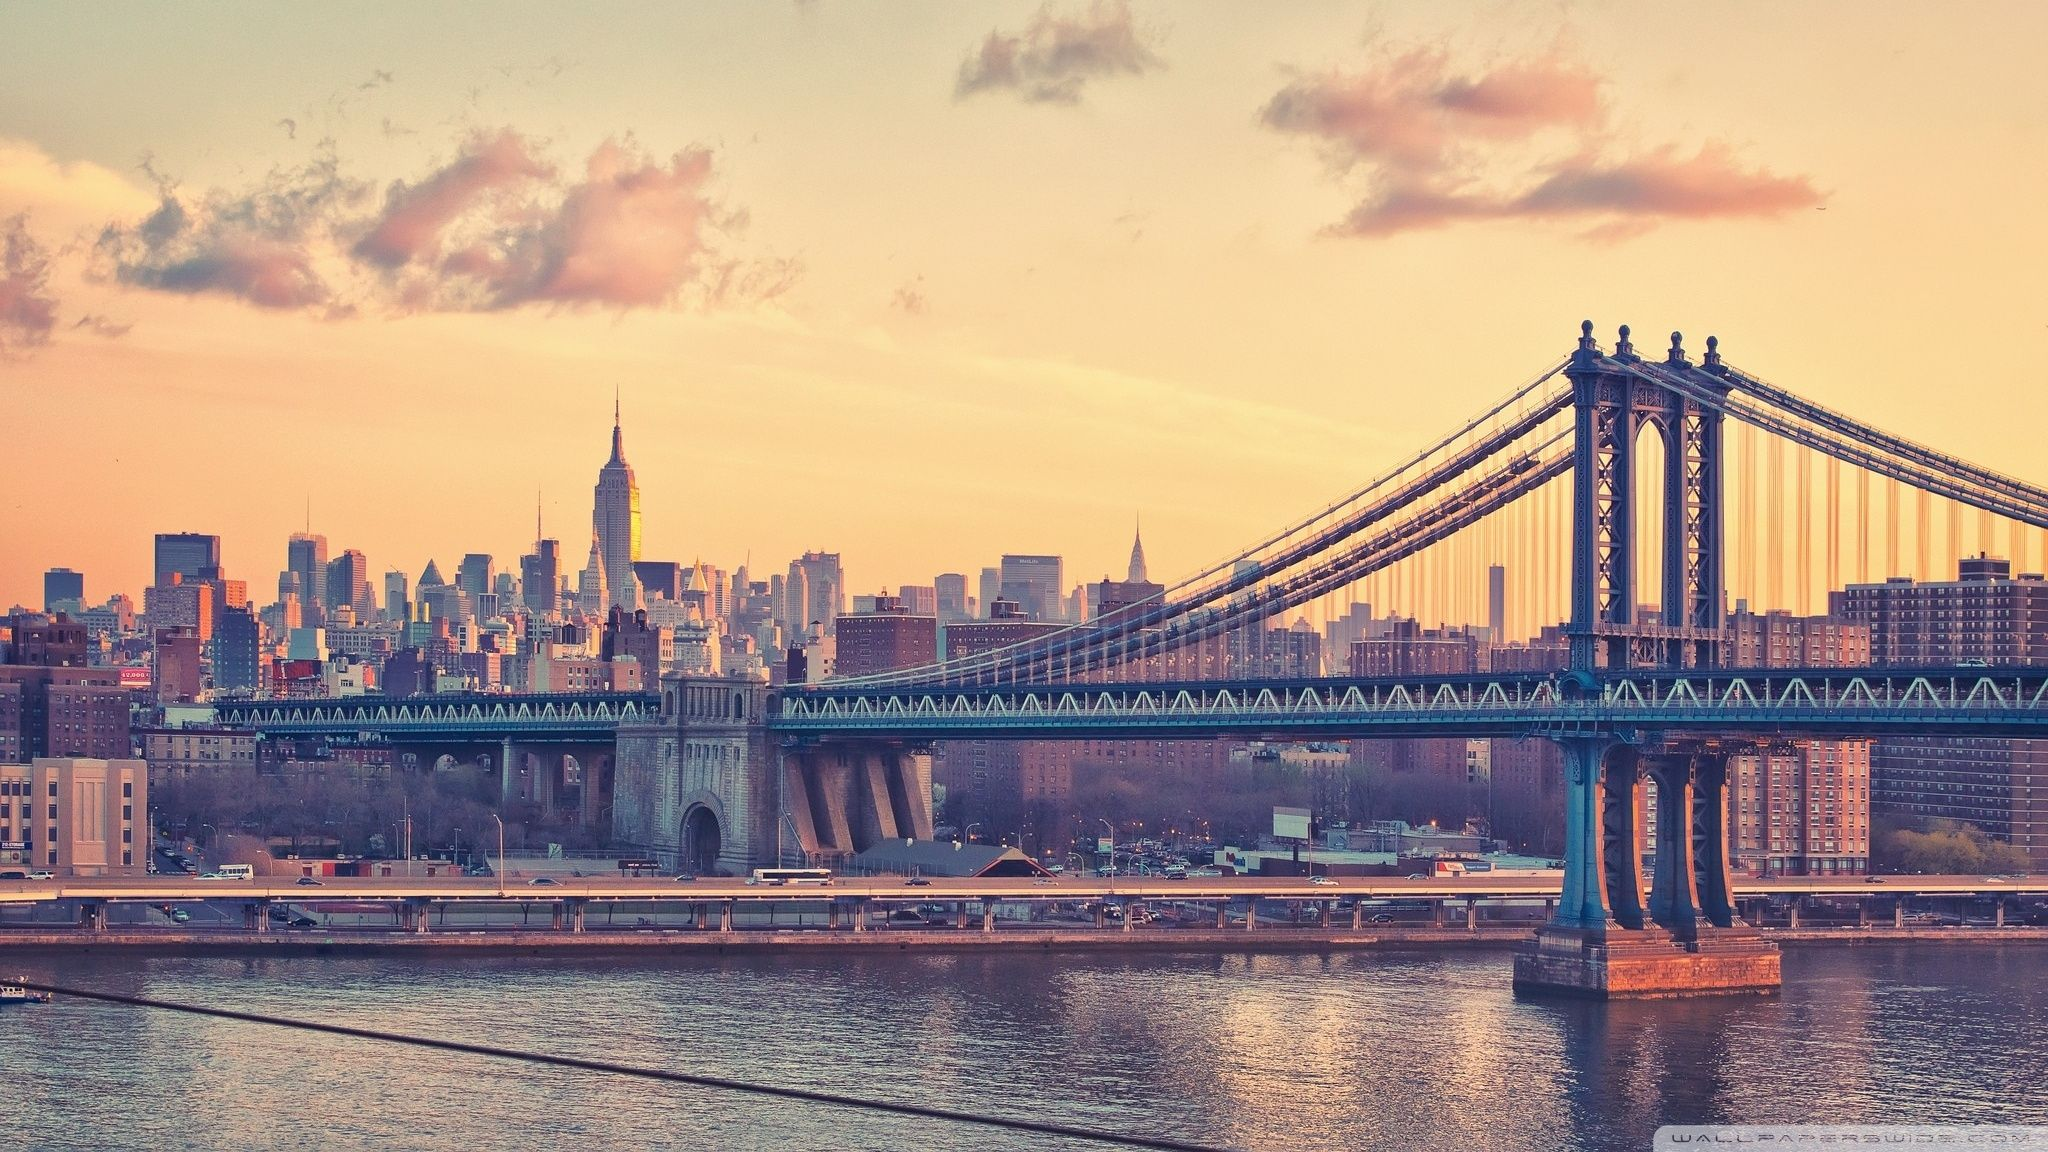 New York City Brooklyn Bridge Let Like Follow Repin It If U Love New York Wallpaper City Wallpaper Bridge Wallpaper